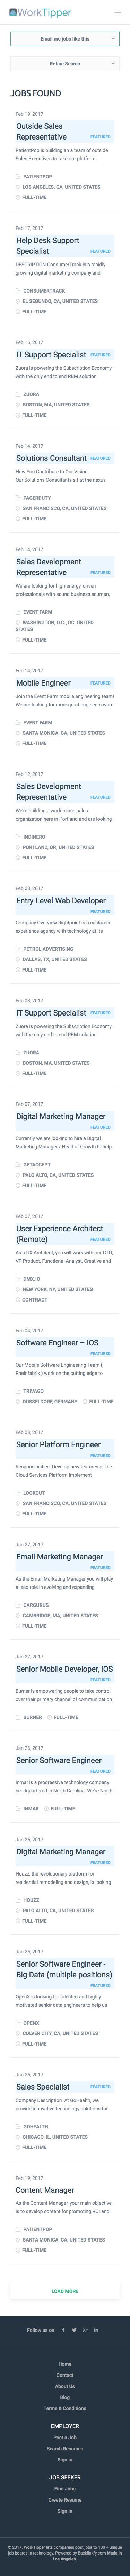 W-Filter jobs.jpg